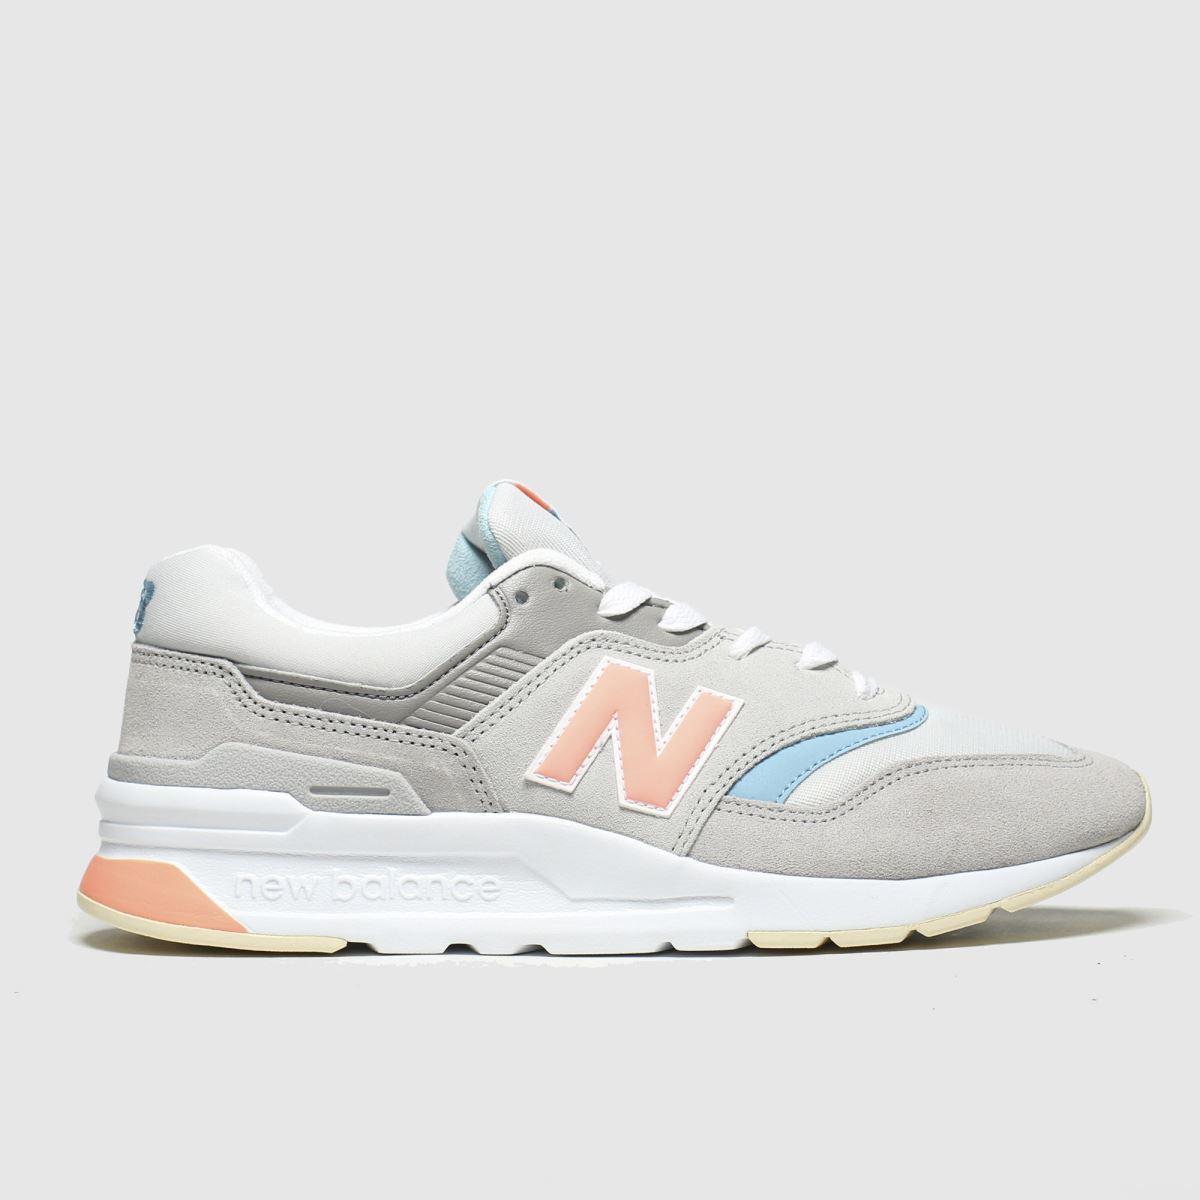 New Balance New Balance Light Grey 997 Trainers